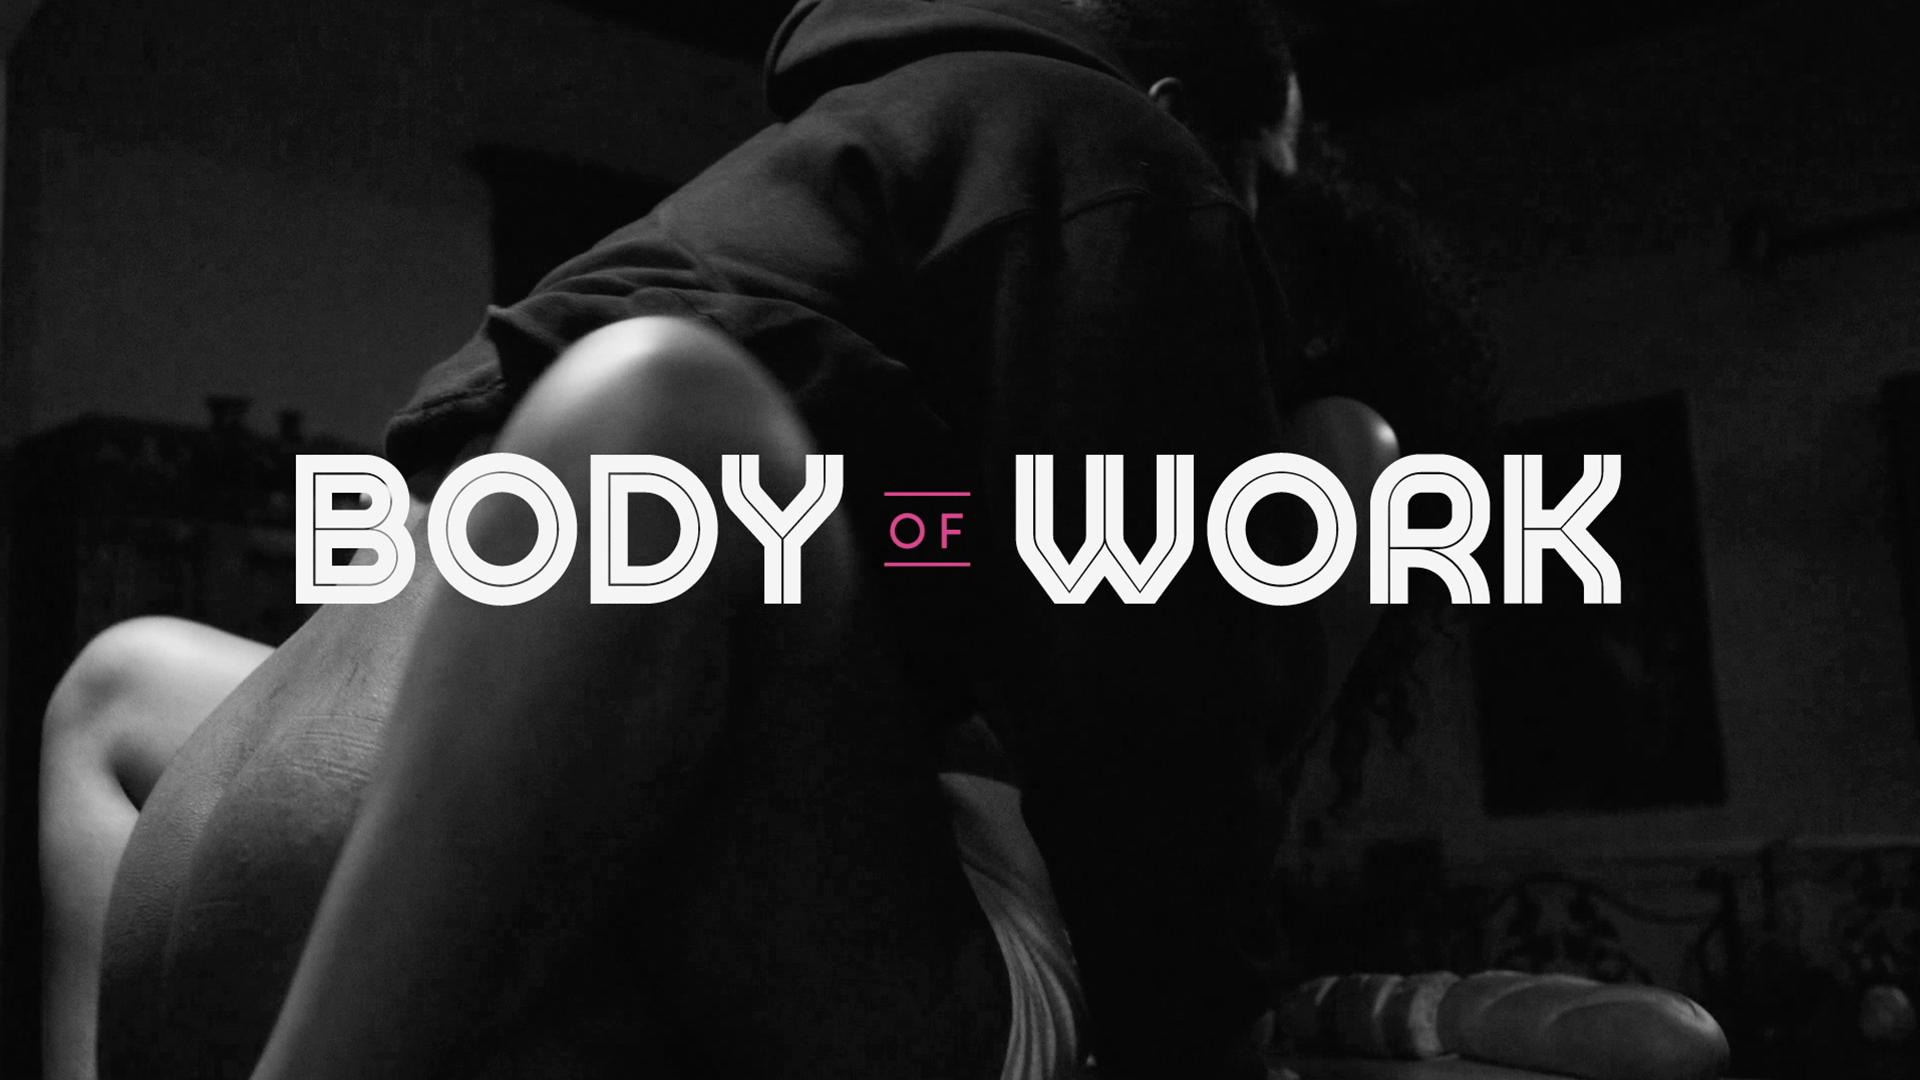 Bodyofwork 50 cent d3 large thumbnail 3 override